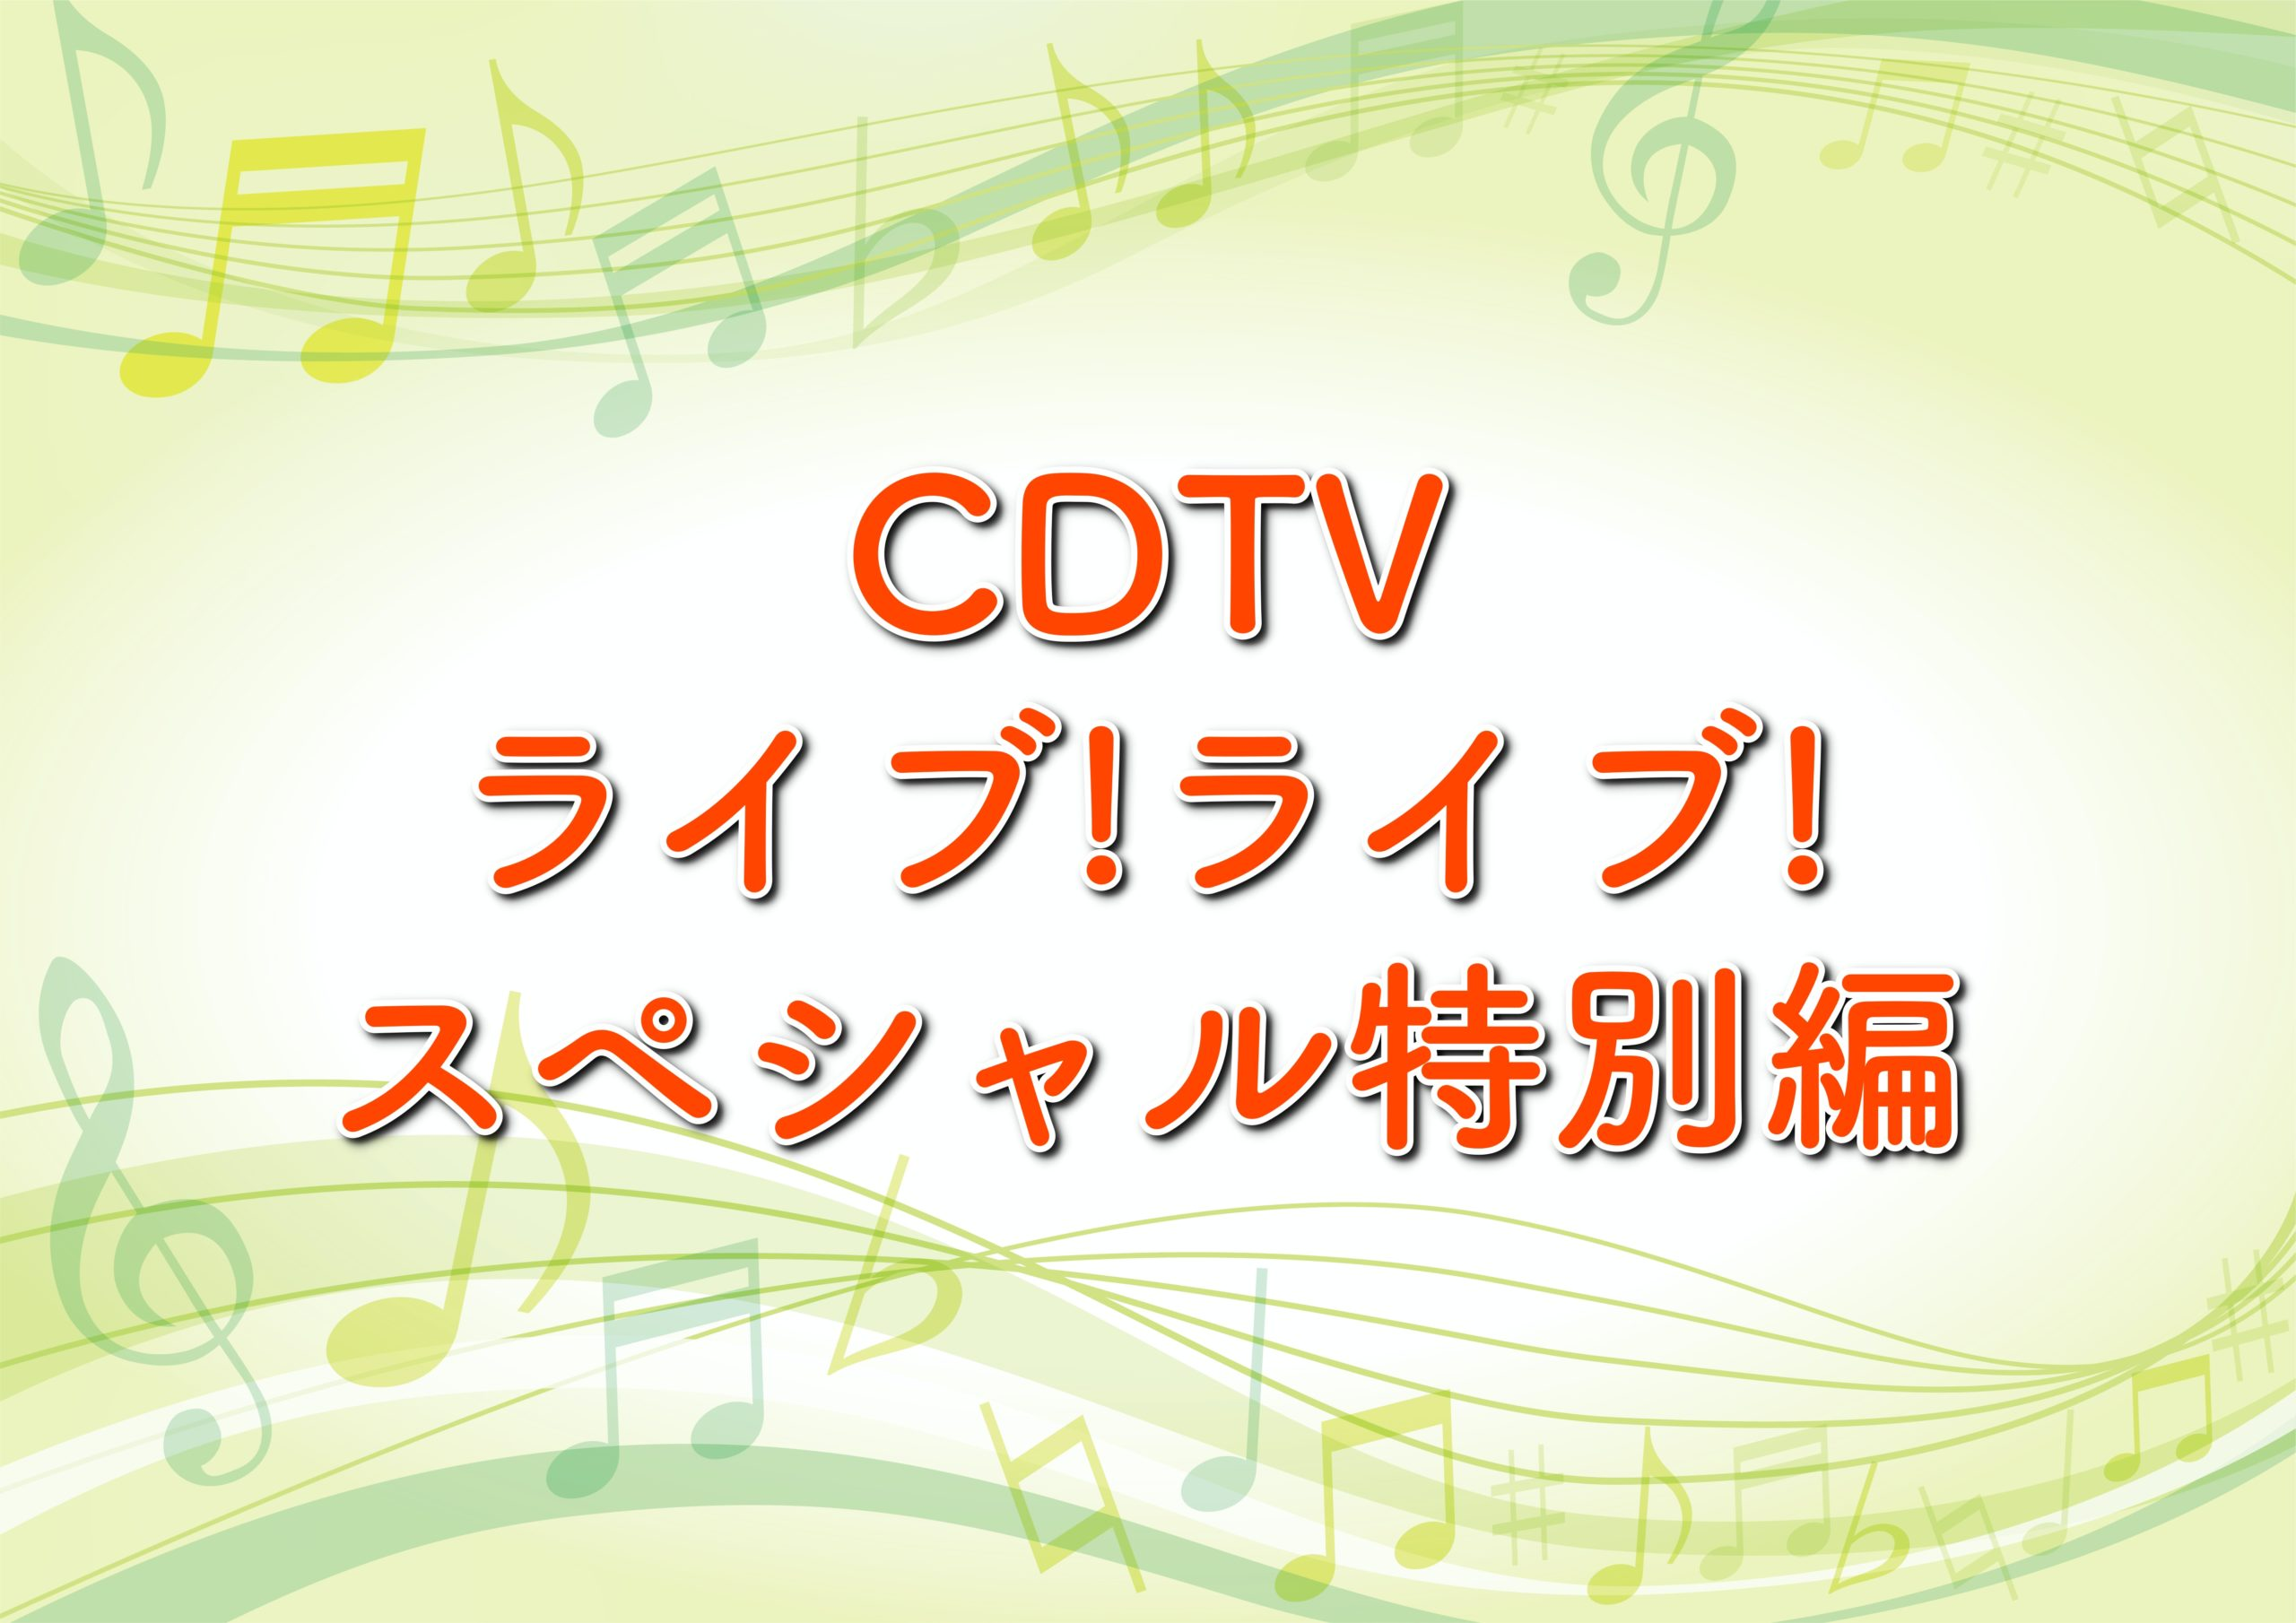 cdtv ライブ ライブ